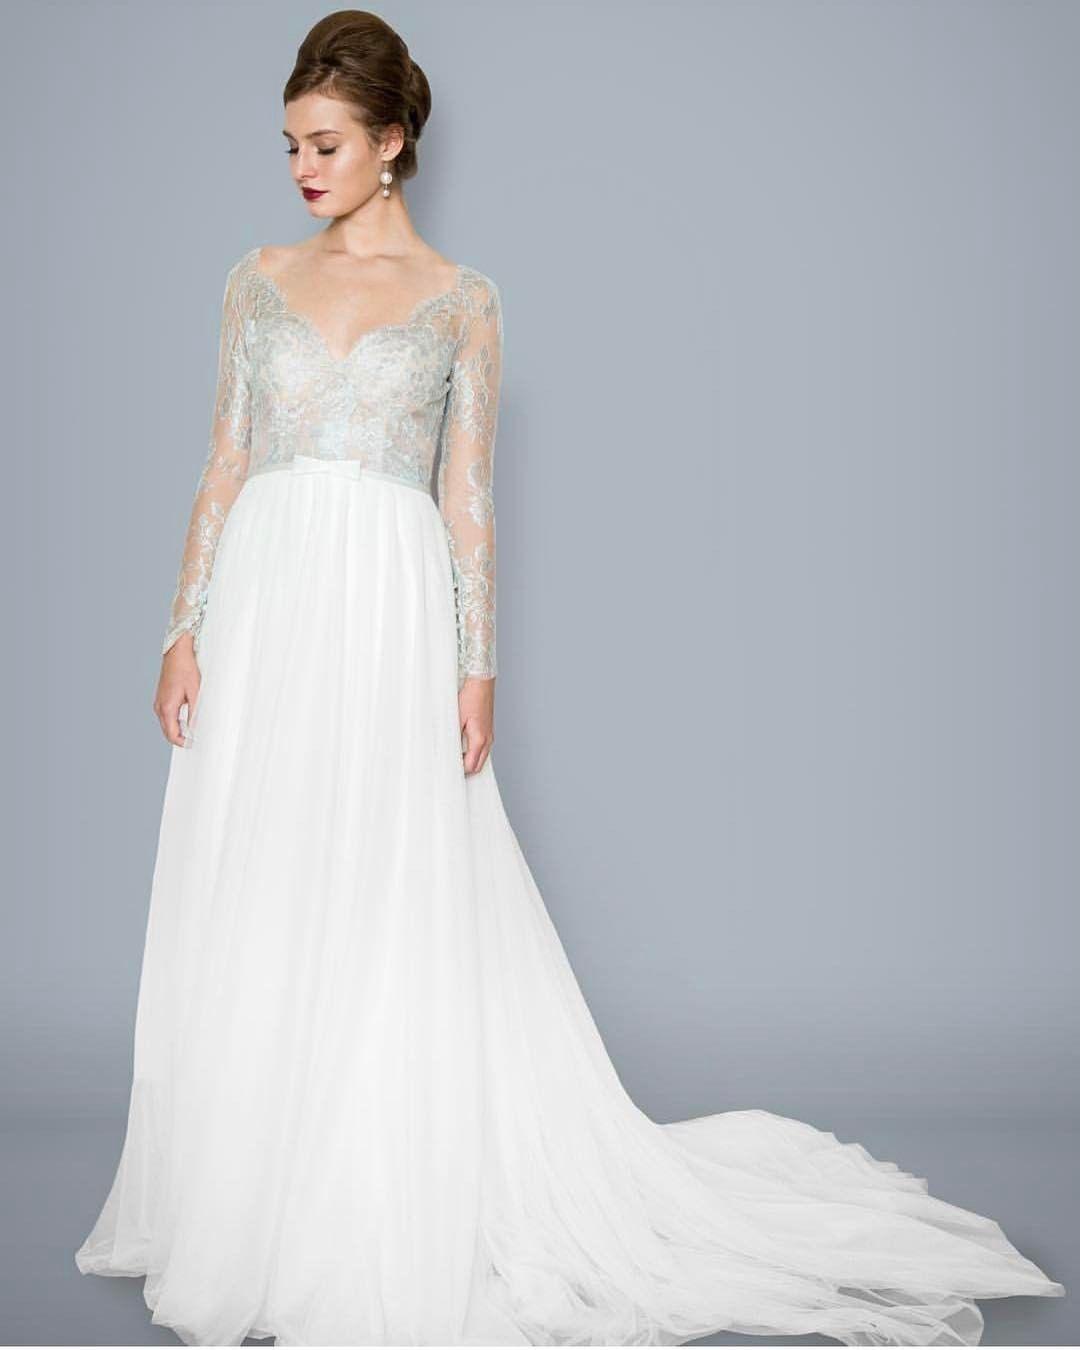 Fine Rosa Clara Bridal Gowns Photos - All Wedding Dresses ...